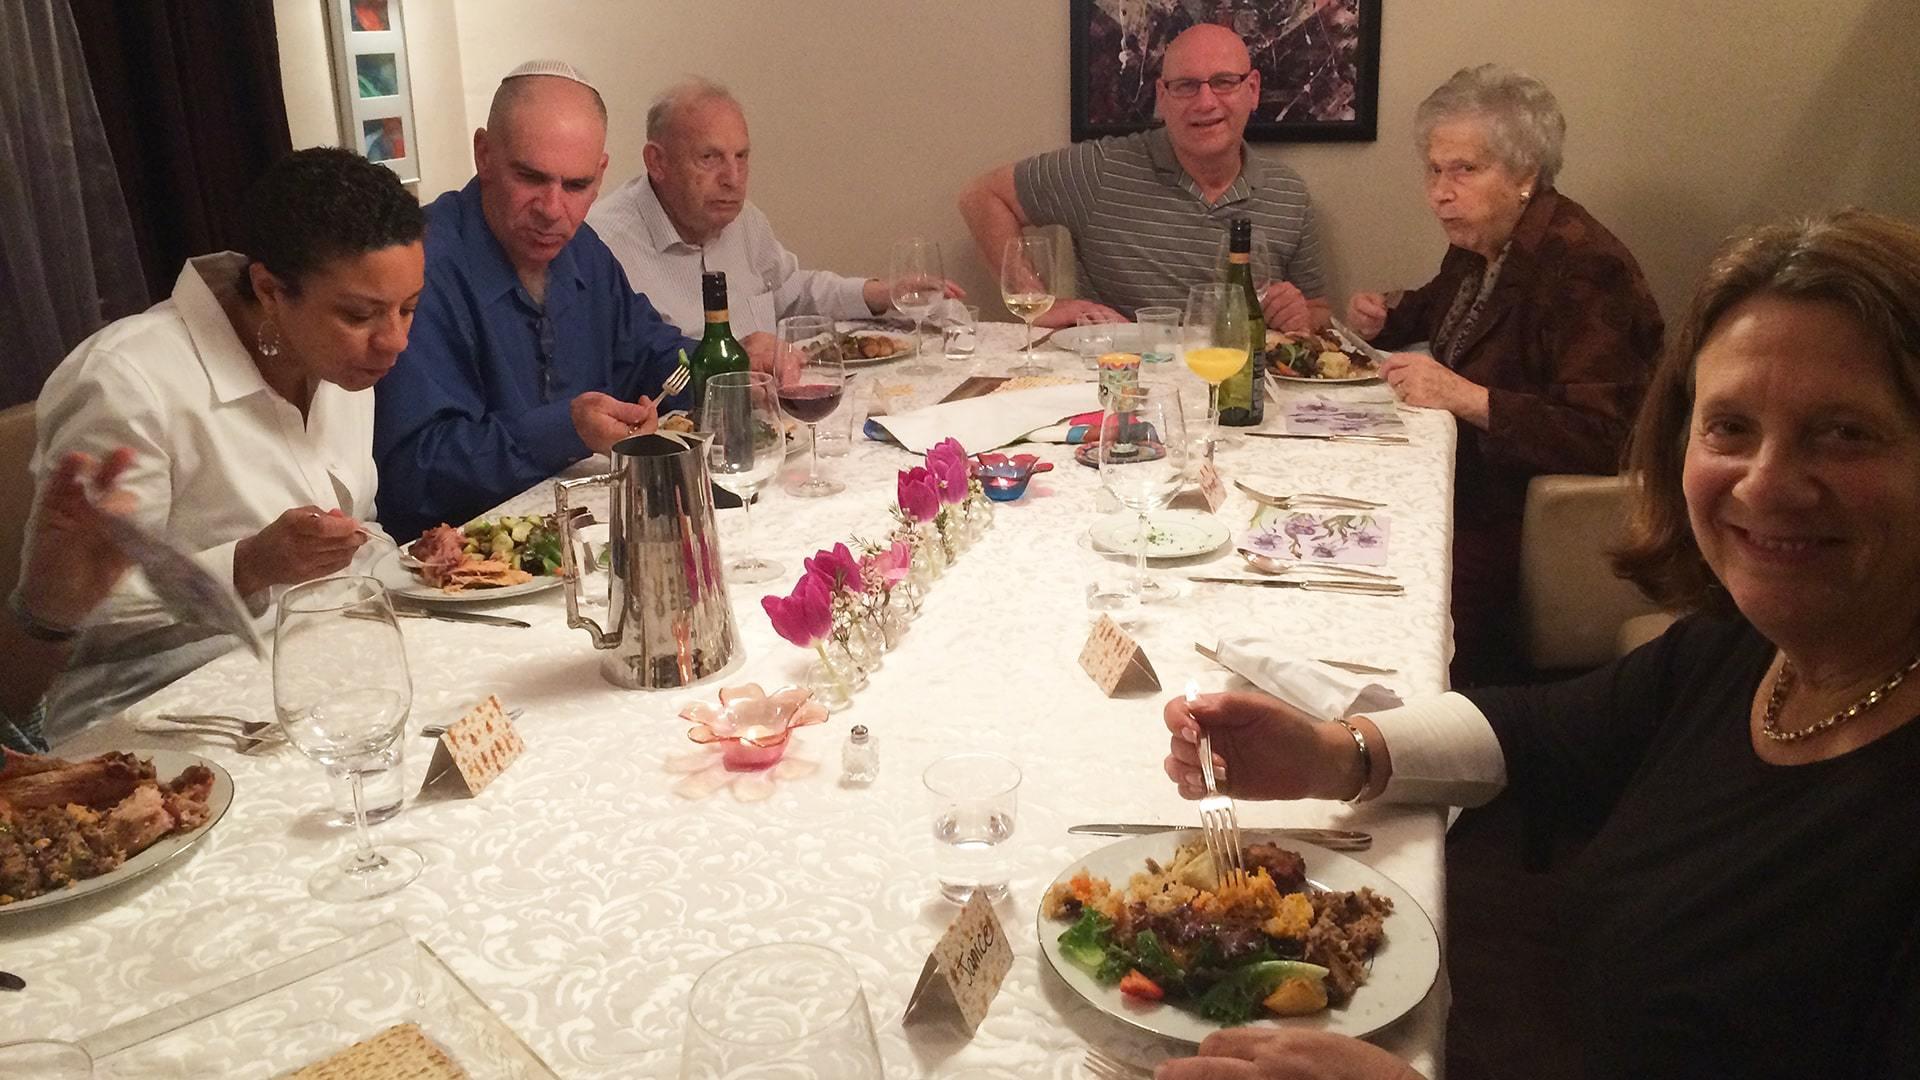 Passover Jewish celebration with family min